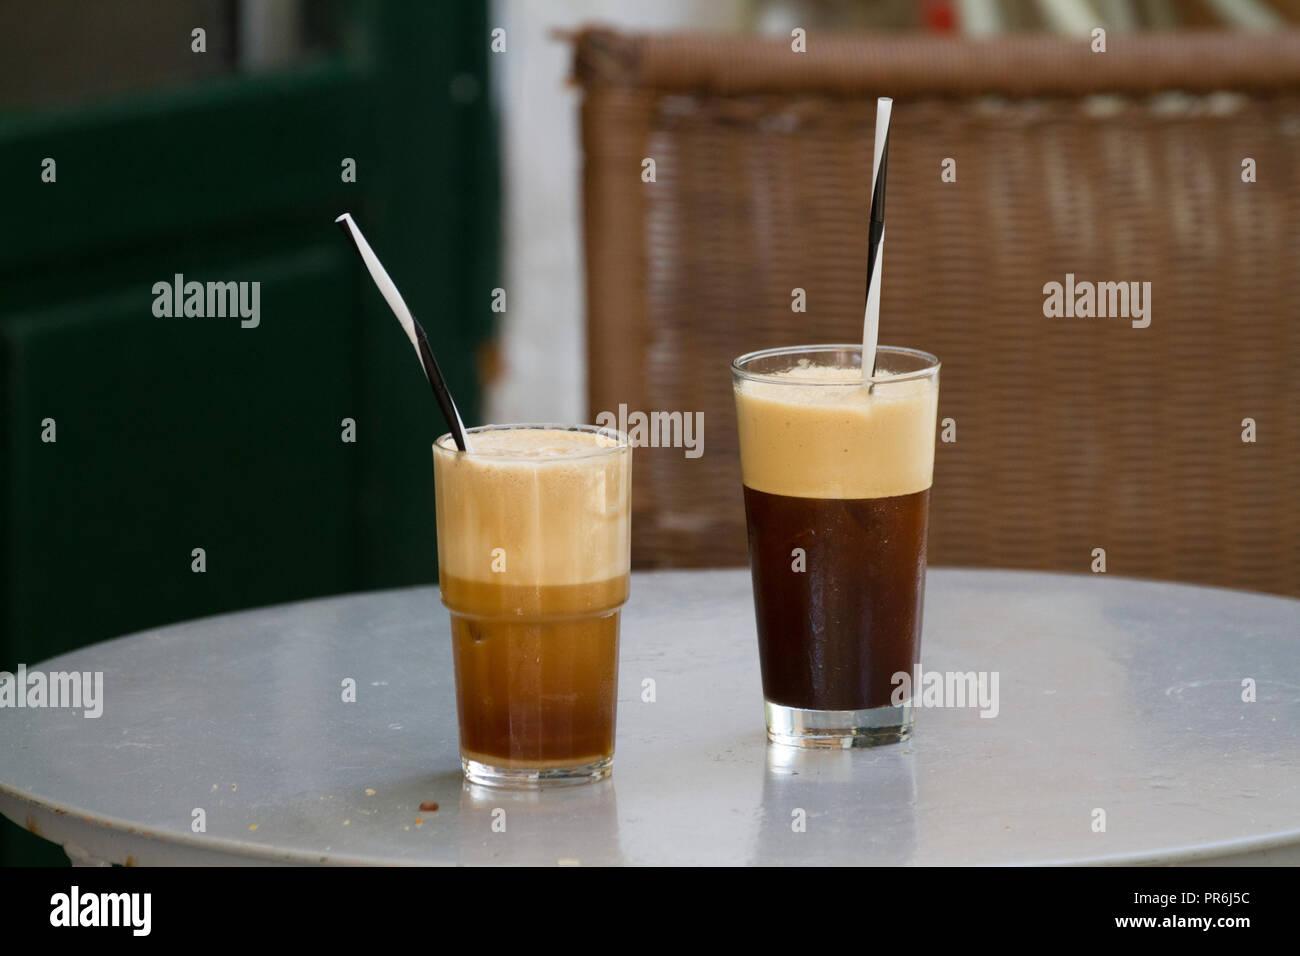 Cafés en vasos, con pajas, esperando a ser borracho Imagen De Stock